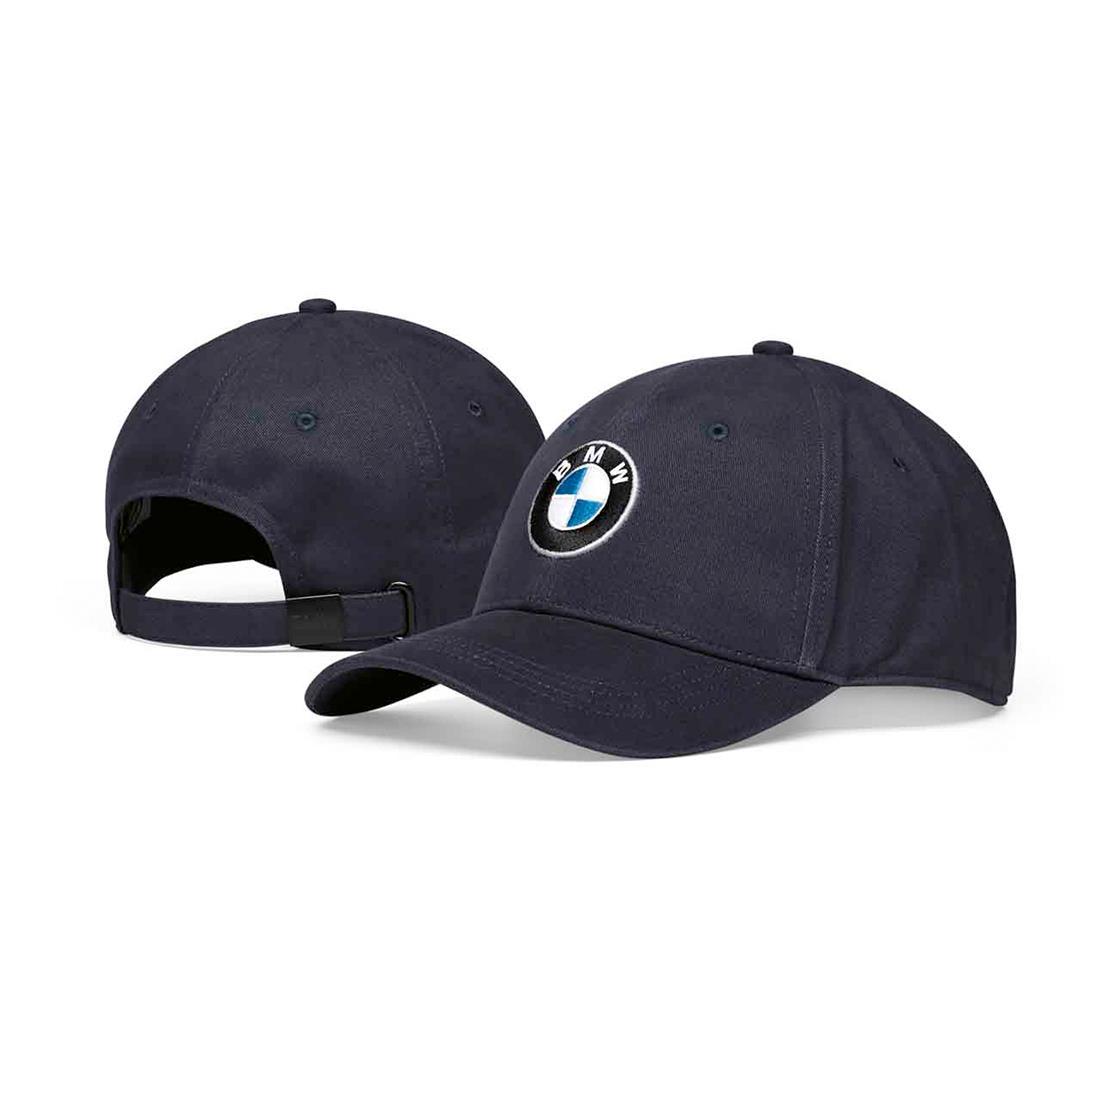 BMW LOGO CAP